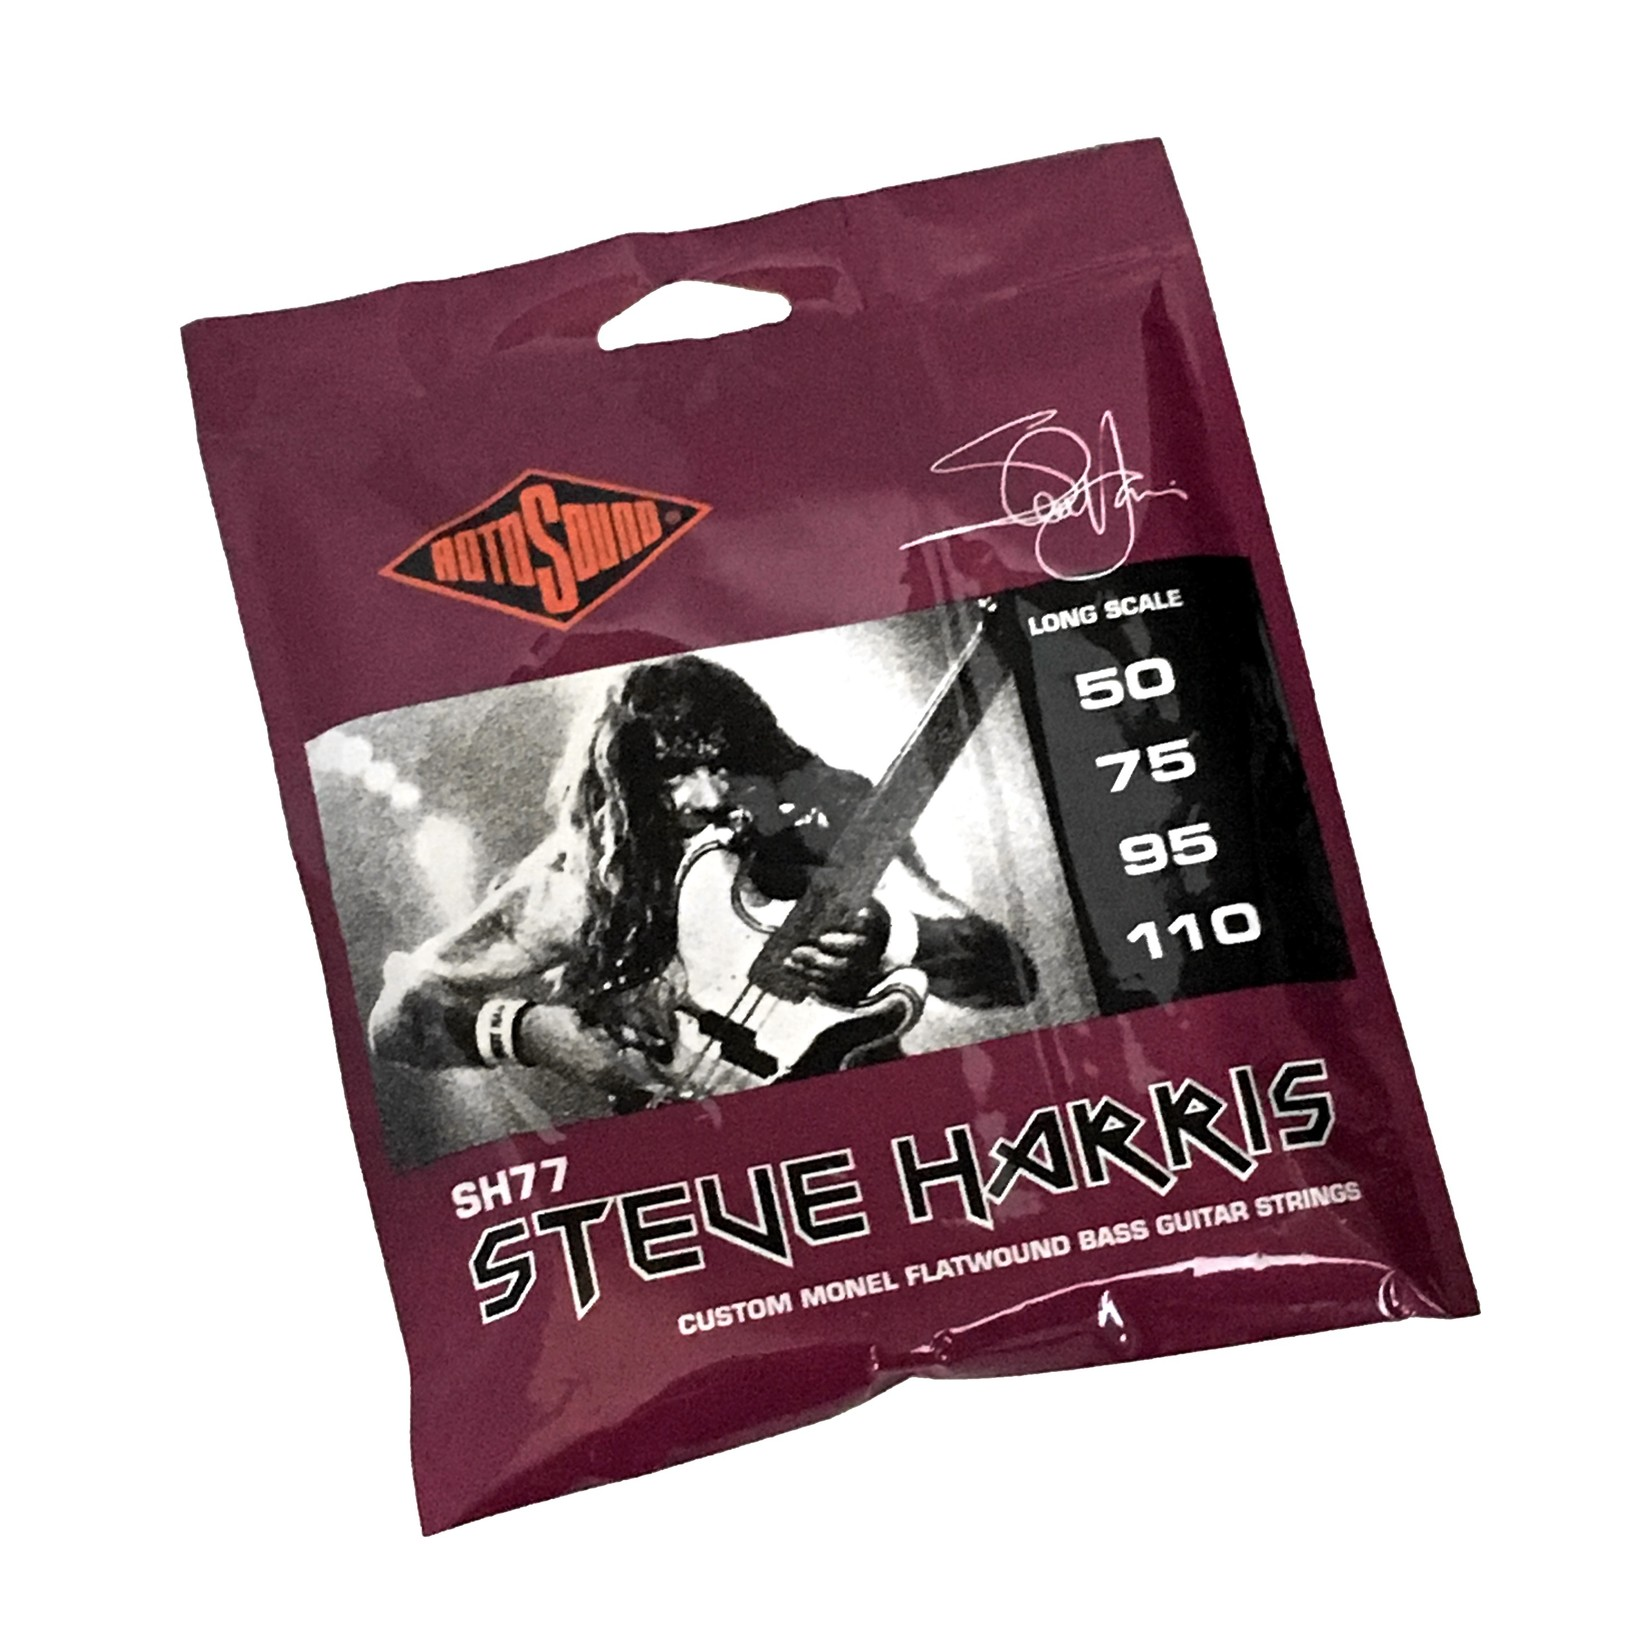 Rotosound Rotosound SH77 Steve Harris (Iron Maiden) Custom Monel Flatwound Bass Guitar Strings (50-110)